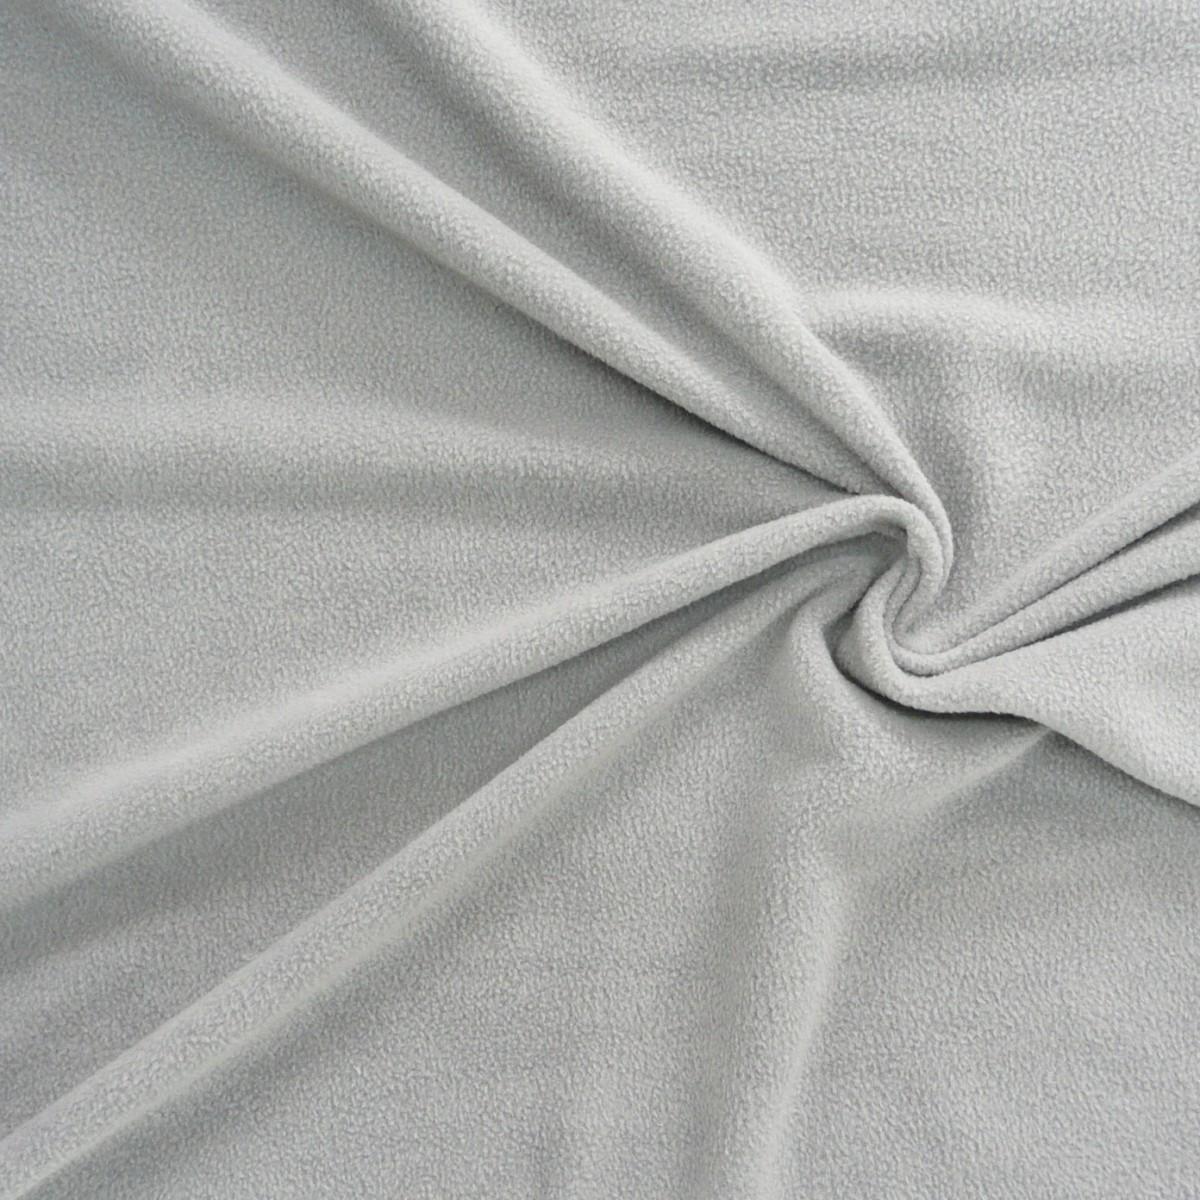 polar fleece stoffe fleecestoff hellgrau stoffe stoffe uni fleece. Black Bedroom Furniture Sets. Home Design Ideas